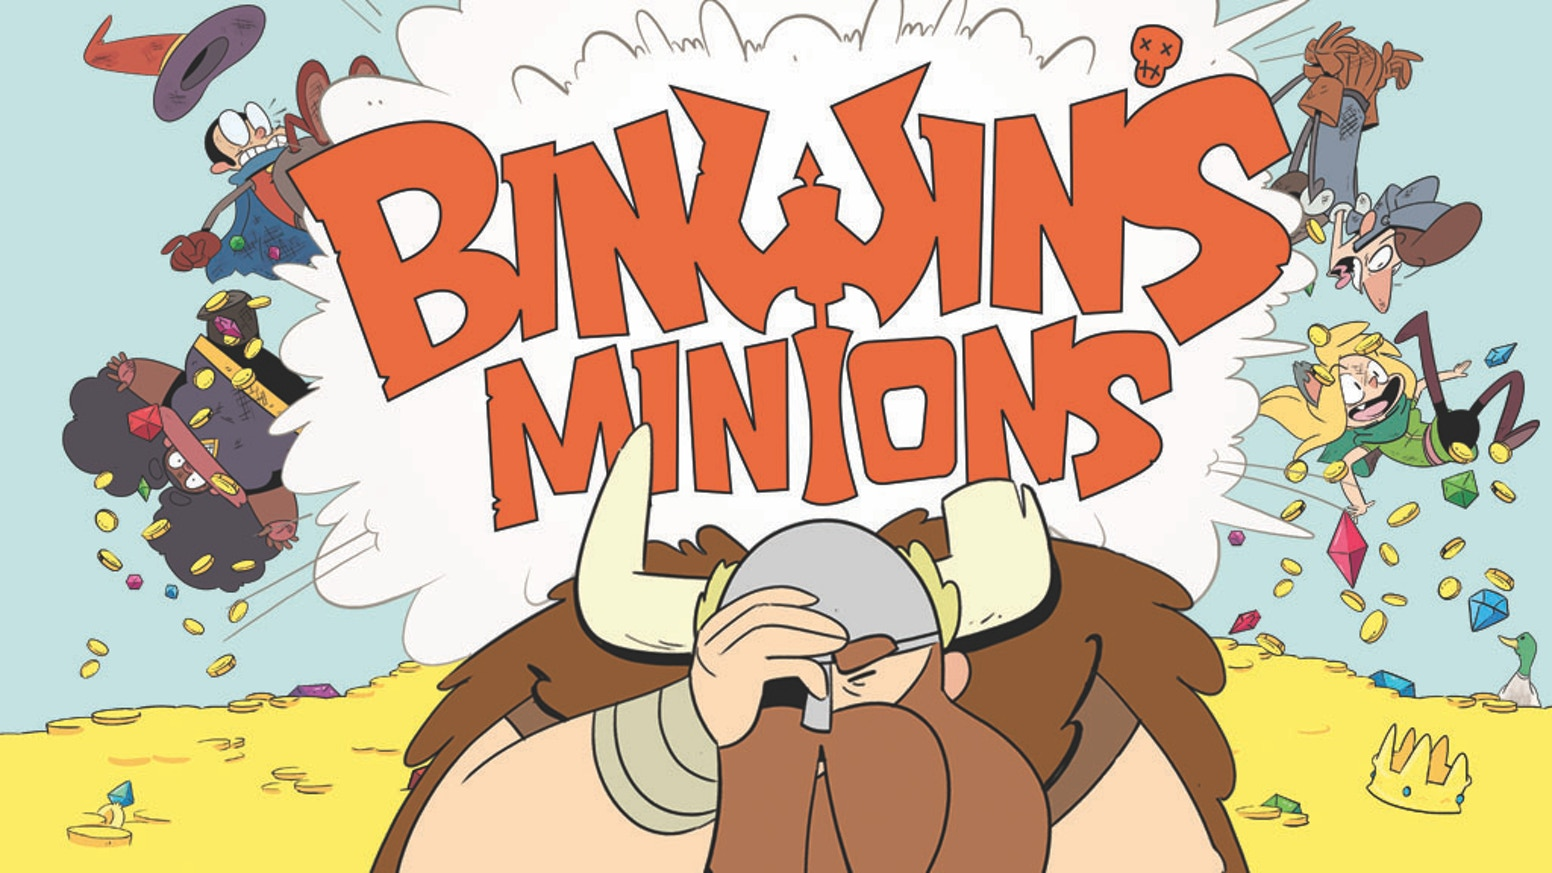 binwin s minions volume 1 by toonhound studios hex chest